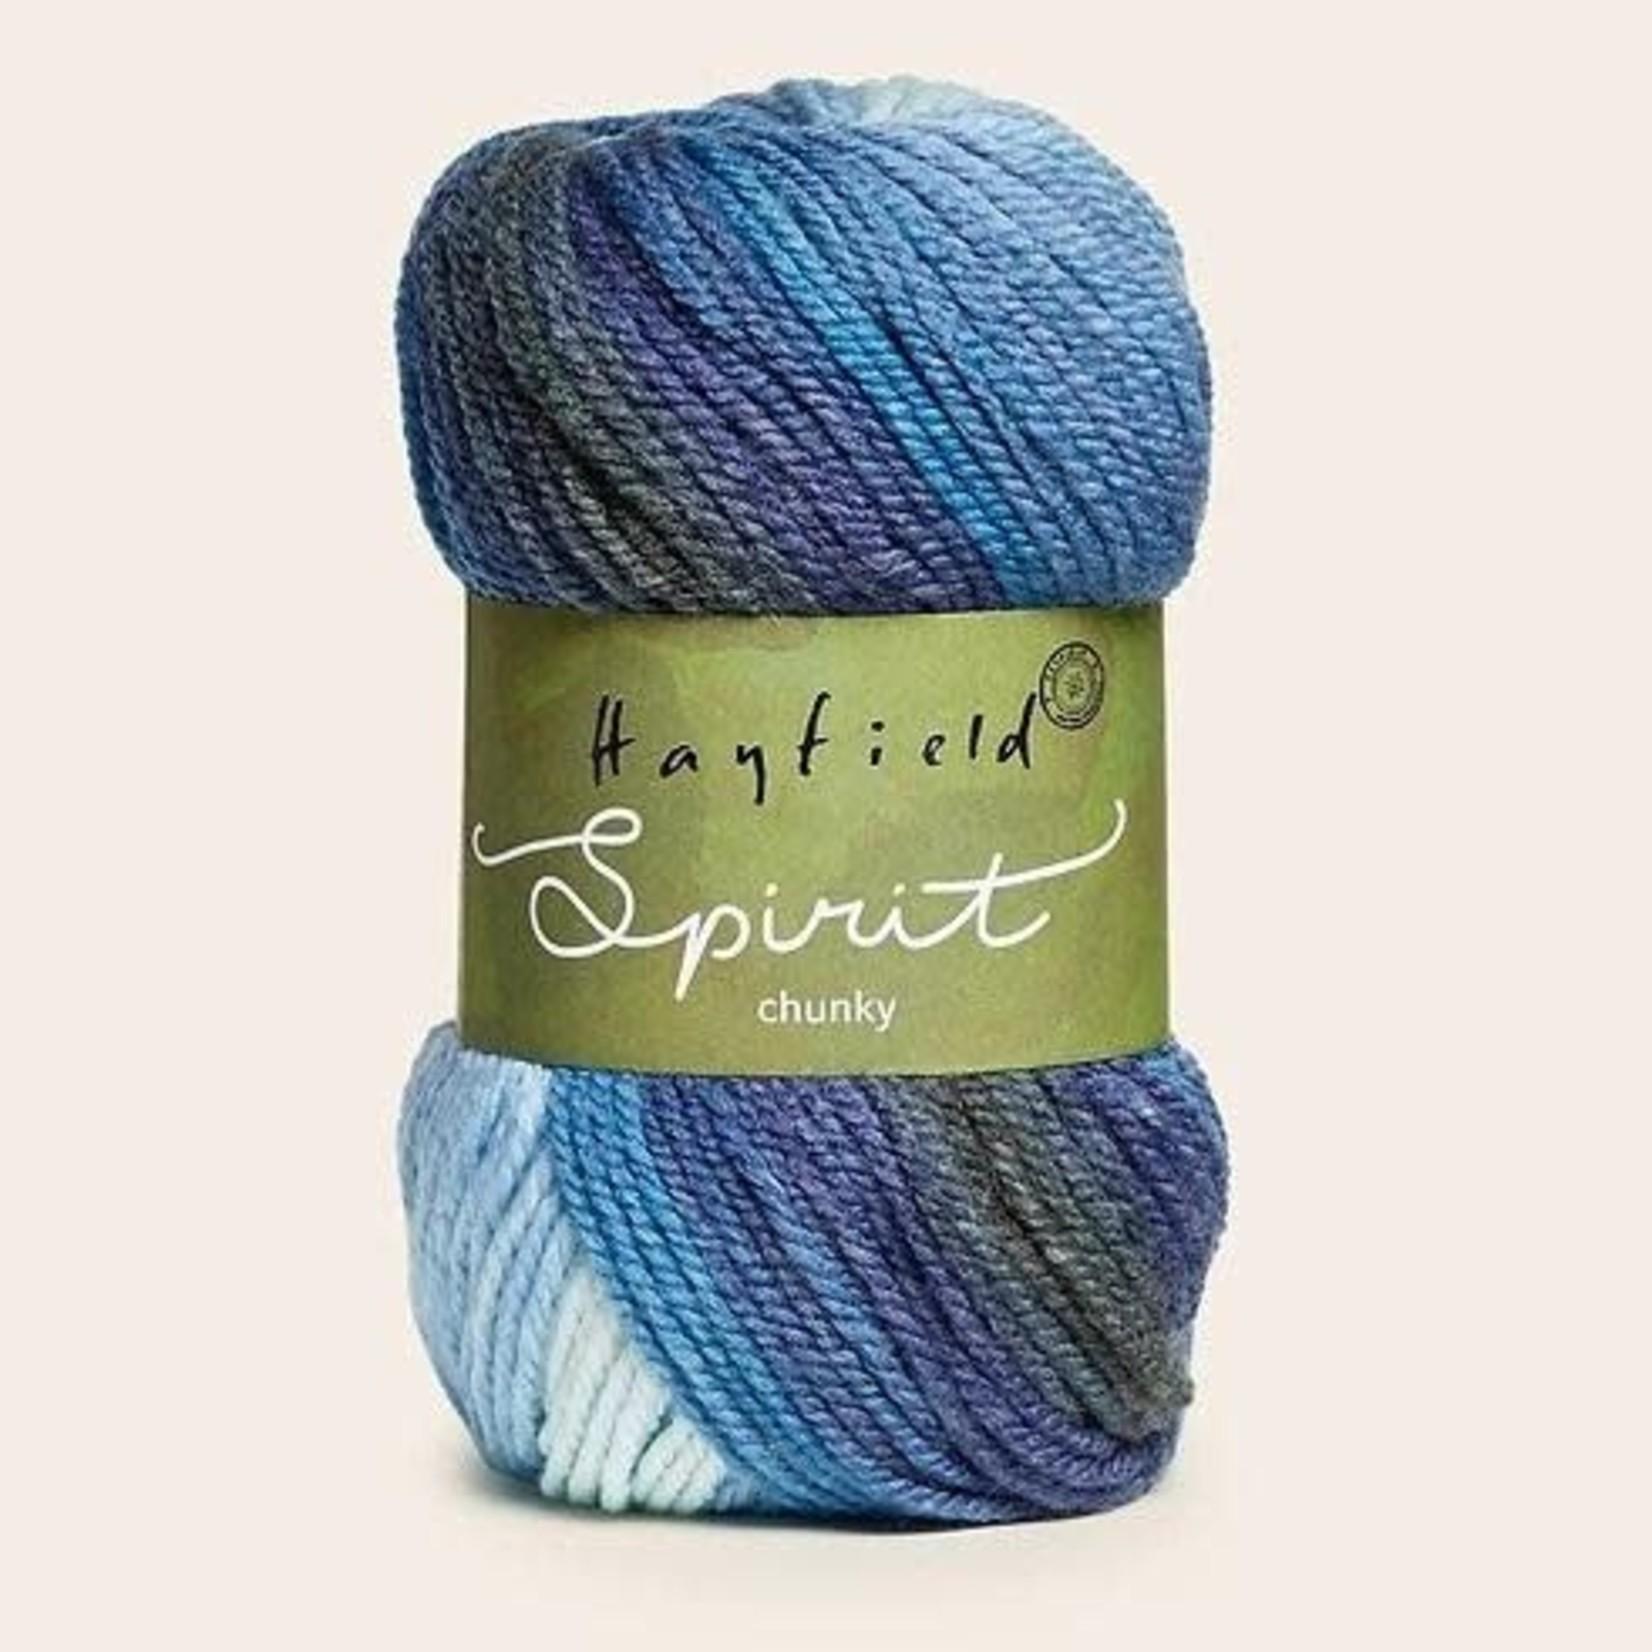 Hayfield Yarn Spirit Chunky by Hayfield